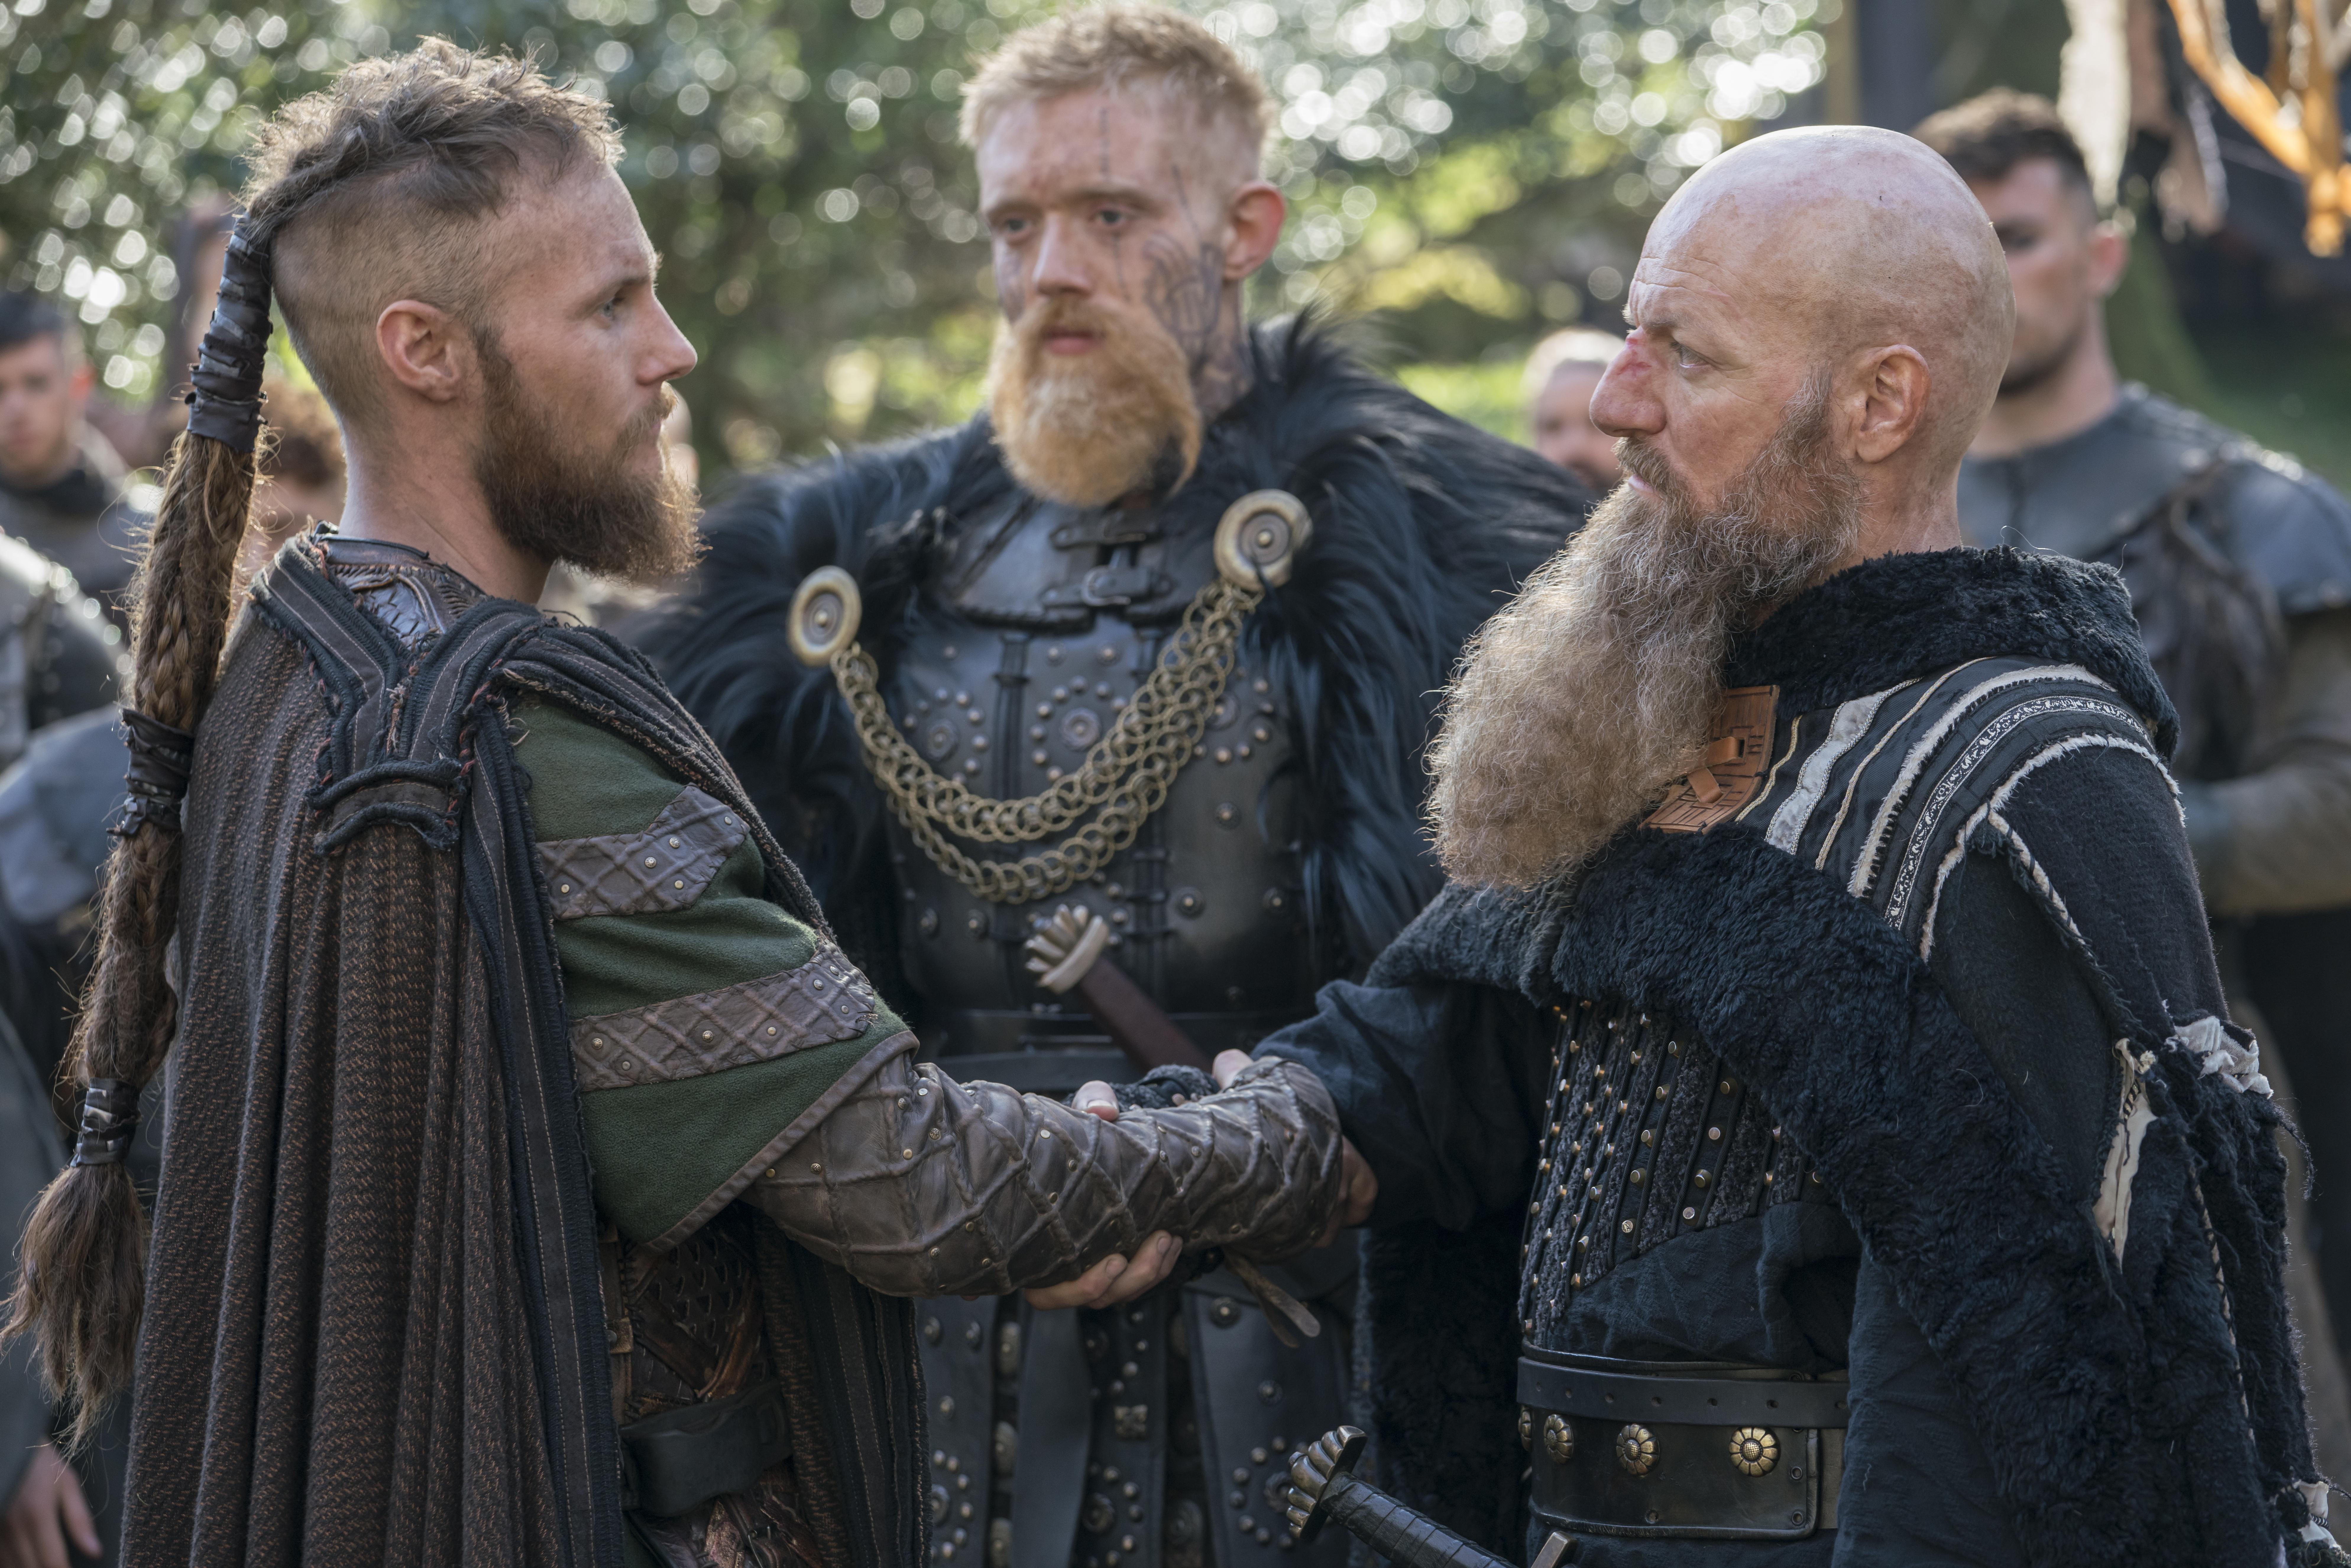 eab3b03a Vikings season 5, episode 18 recap: Baldur